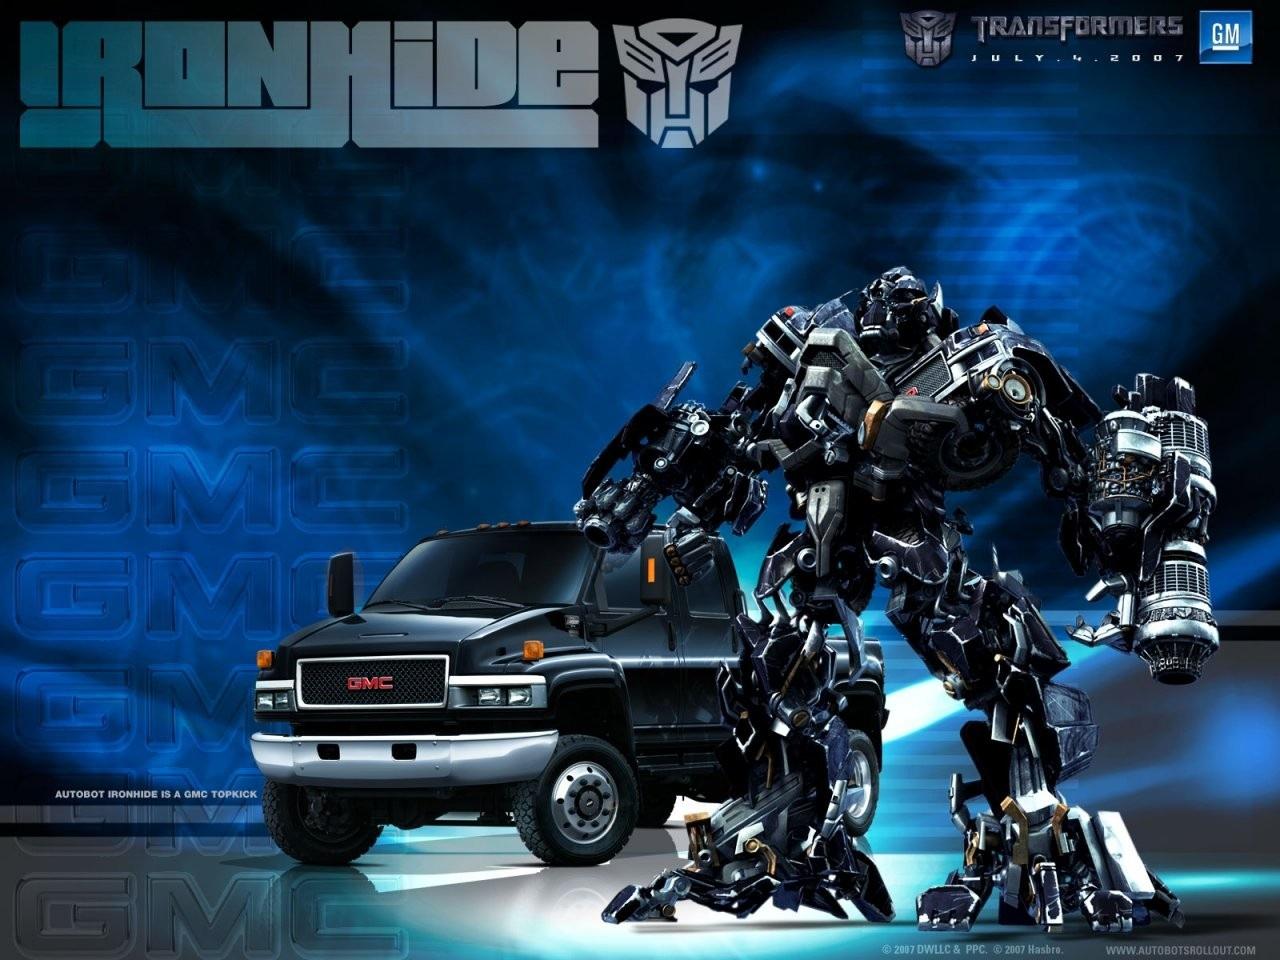 image - transformers2 ironhide wallpaper 3 | evolutions